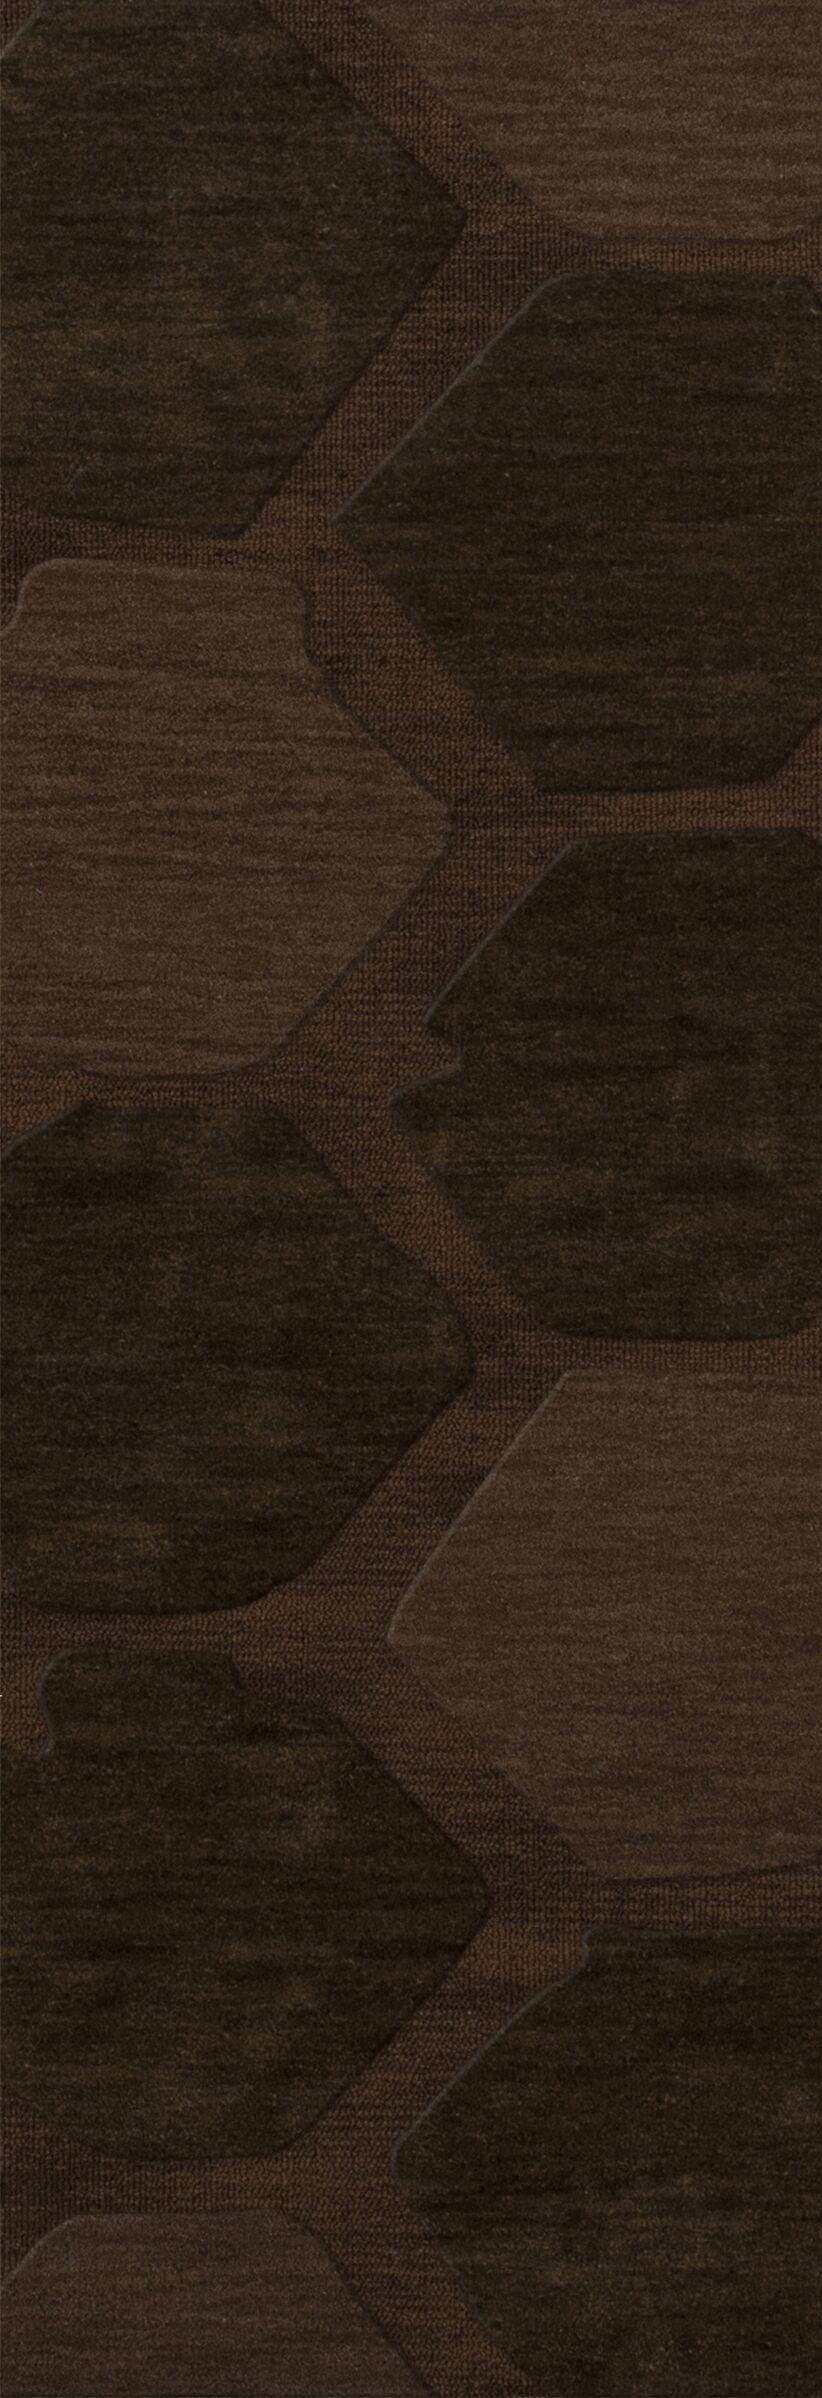 Harmonia Wool Nutmeg Area Rug Rug Size: Runner 2'6